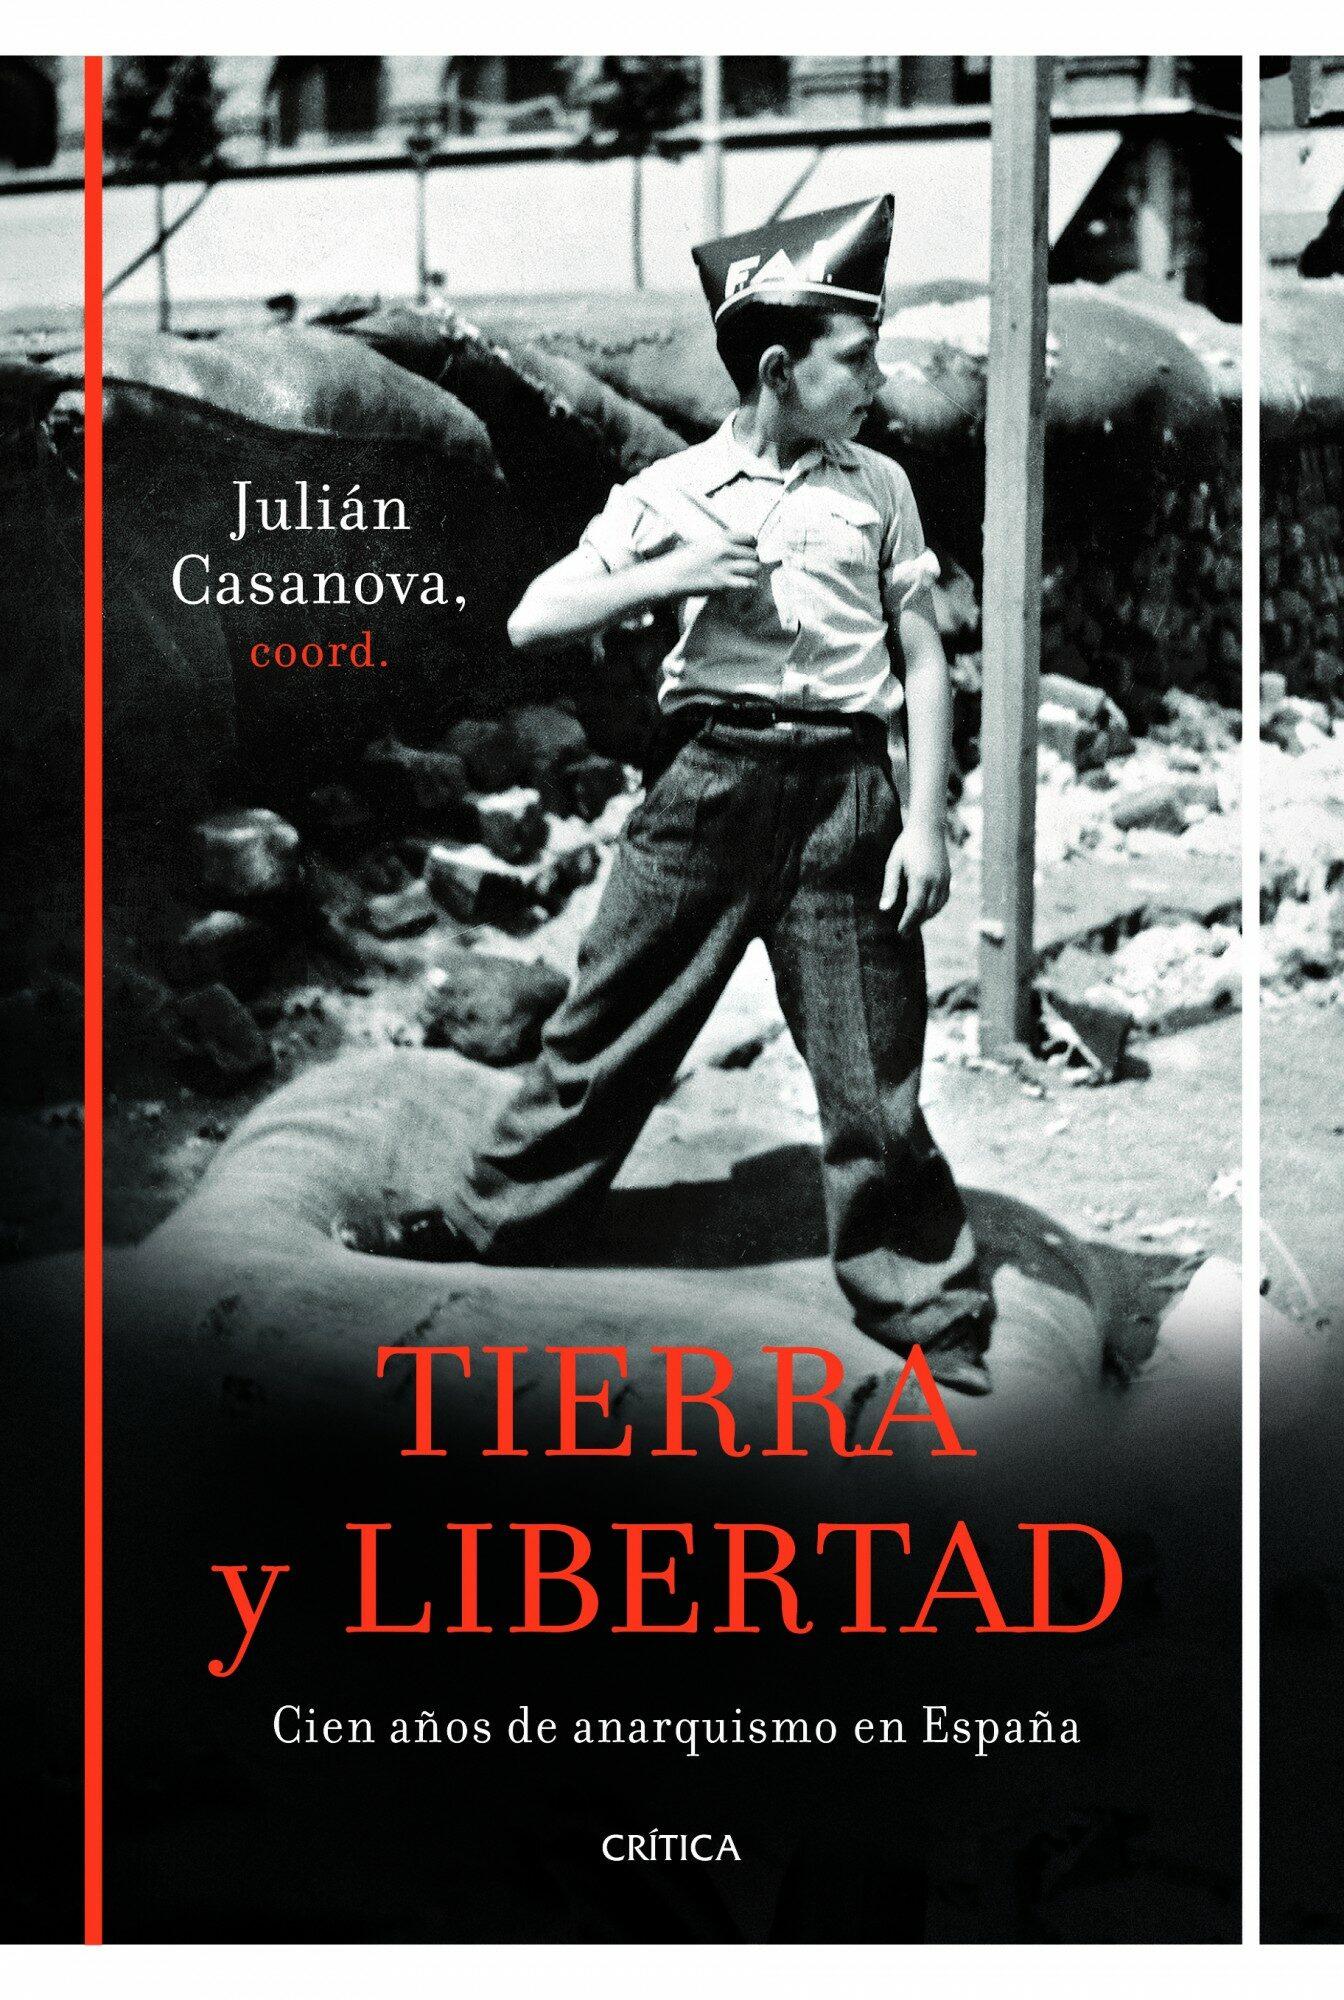 tierra y libertad-julian casanova-9788498923261